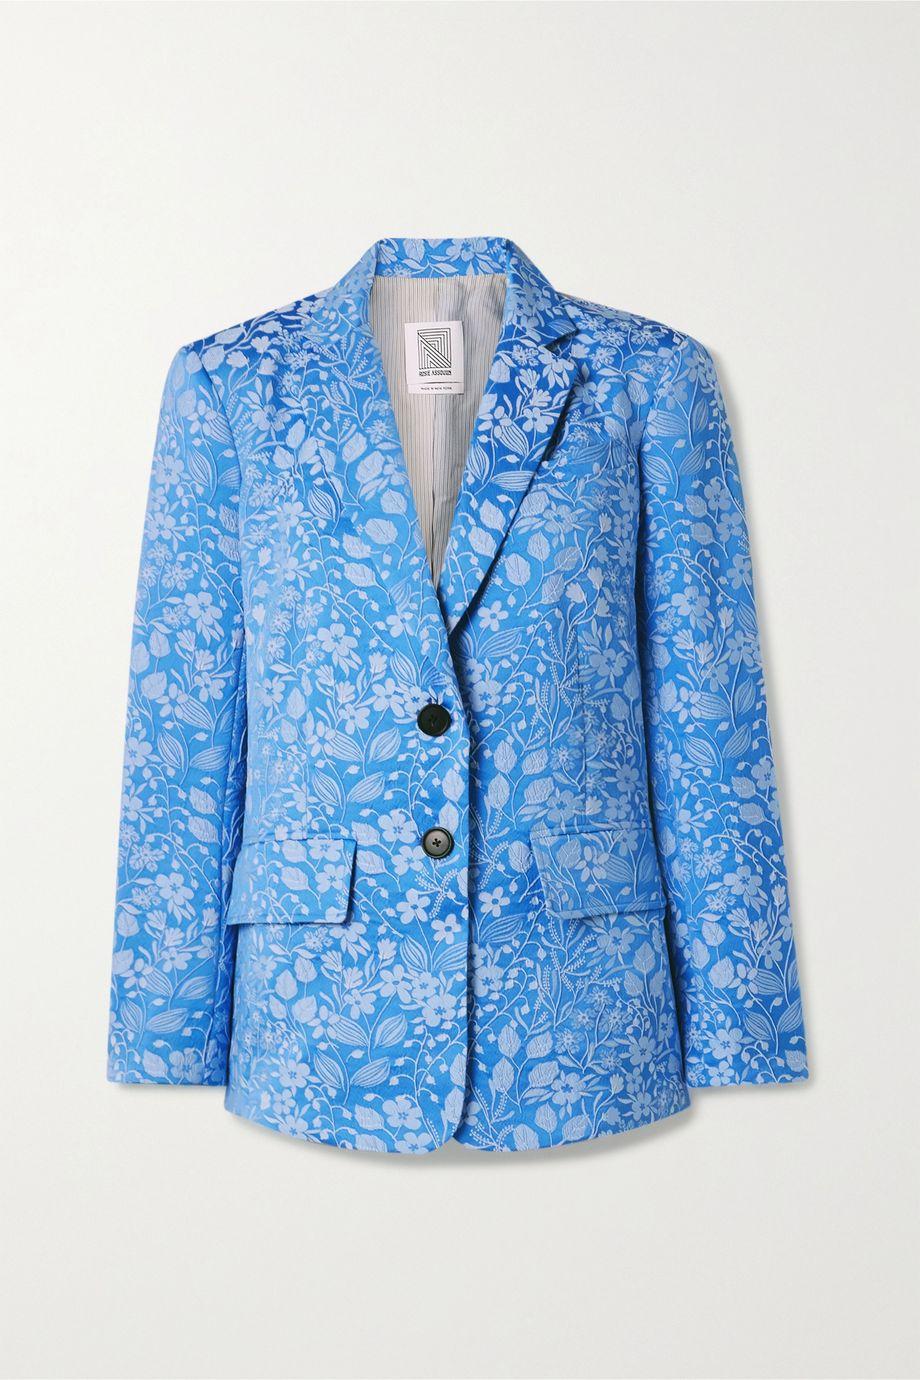 Rosie Assoulin Floral-jacquard blazer